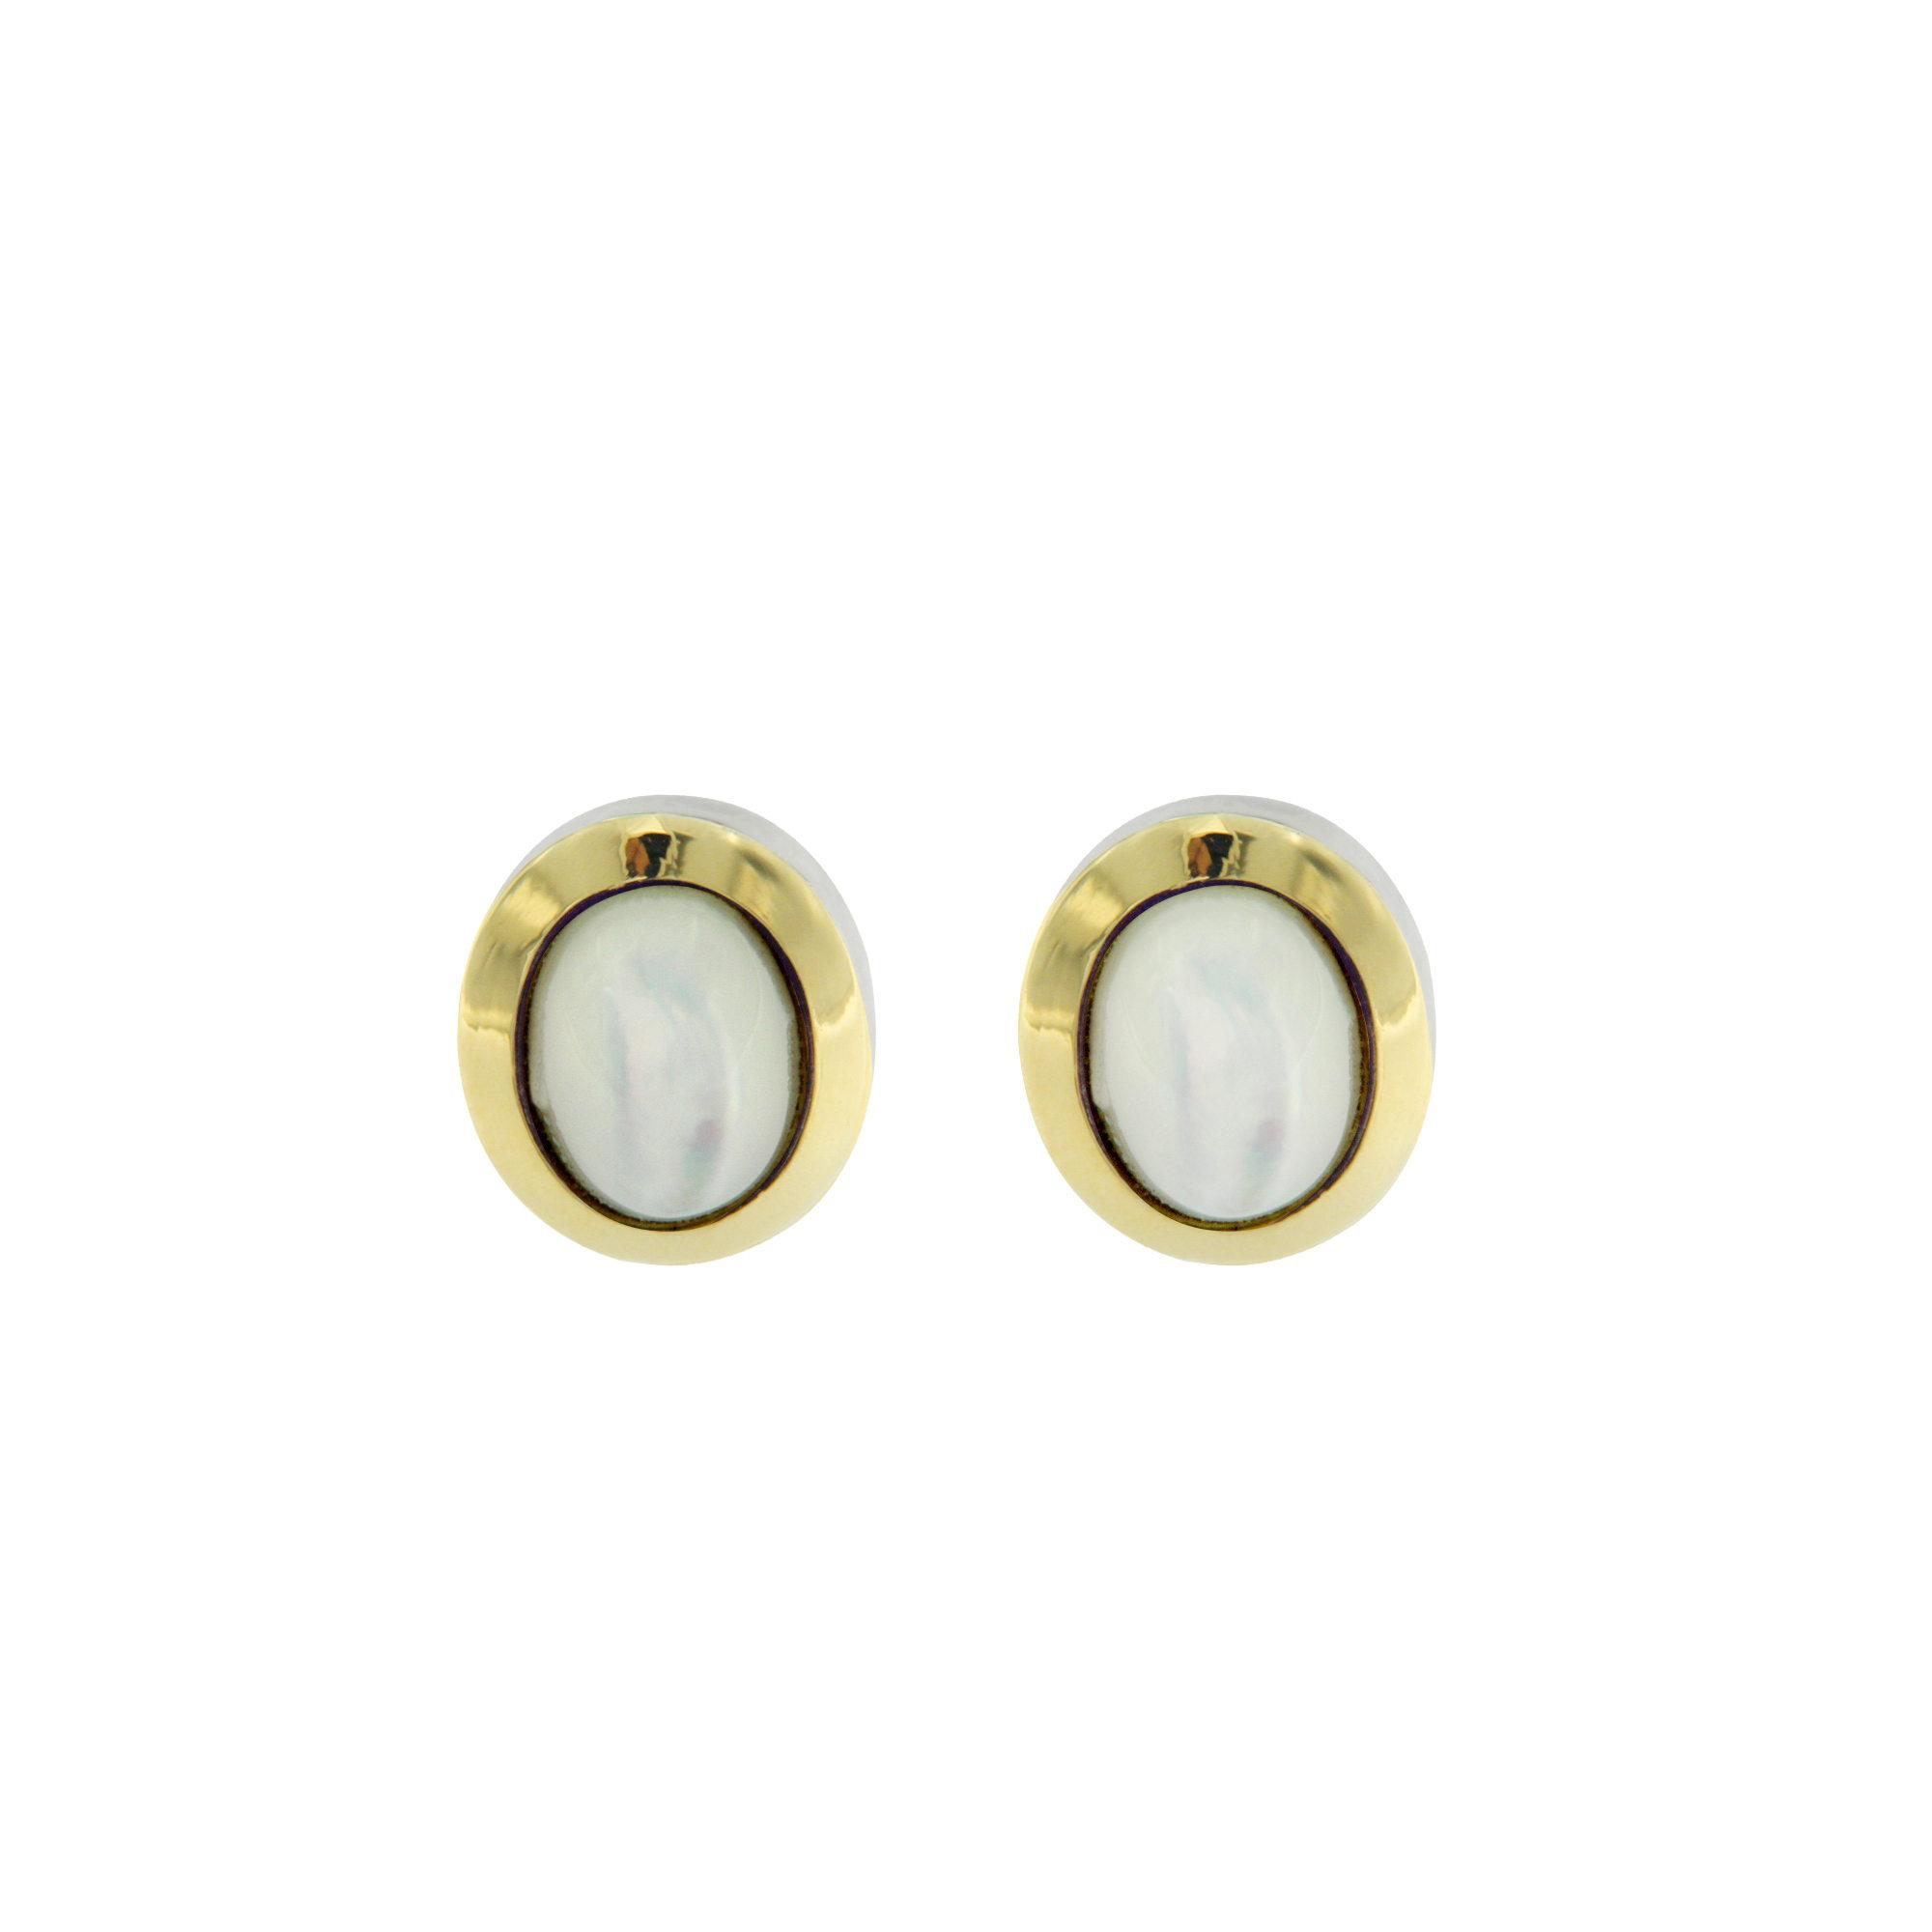 NUOVA orecchini-tubogas-argento-e-madreperla-ORT001mp